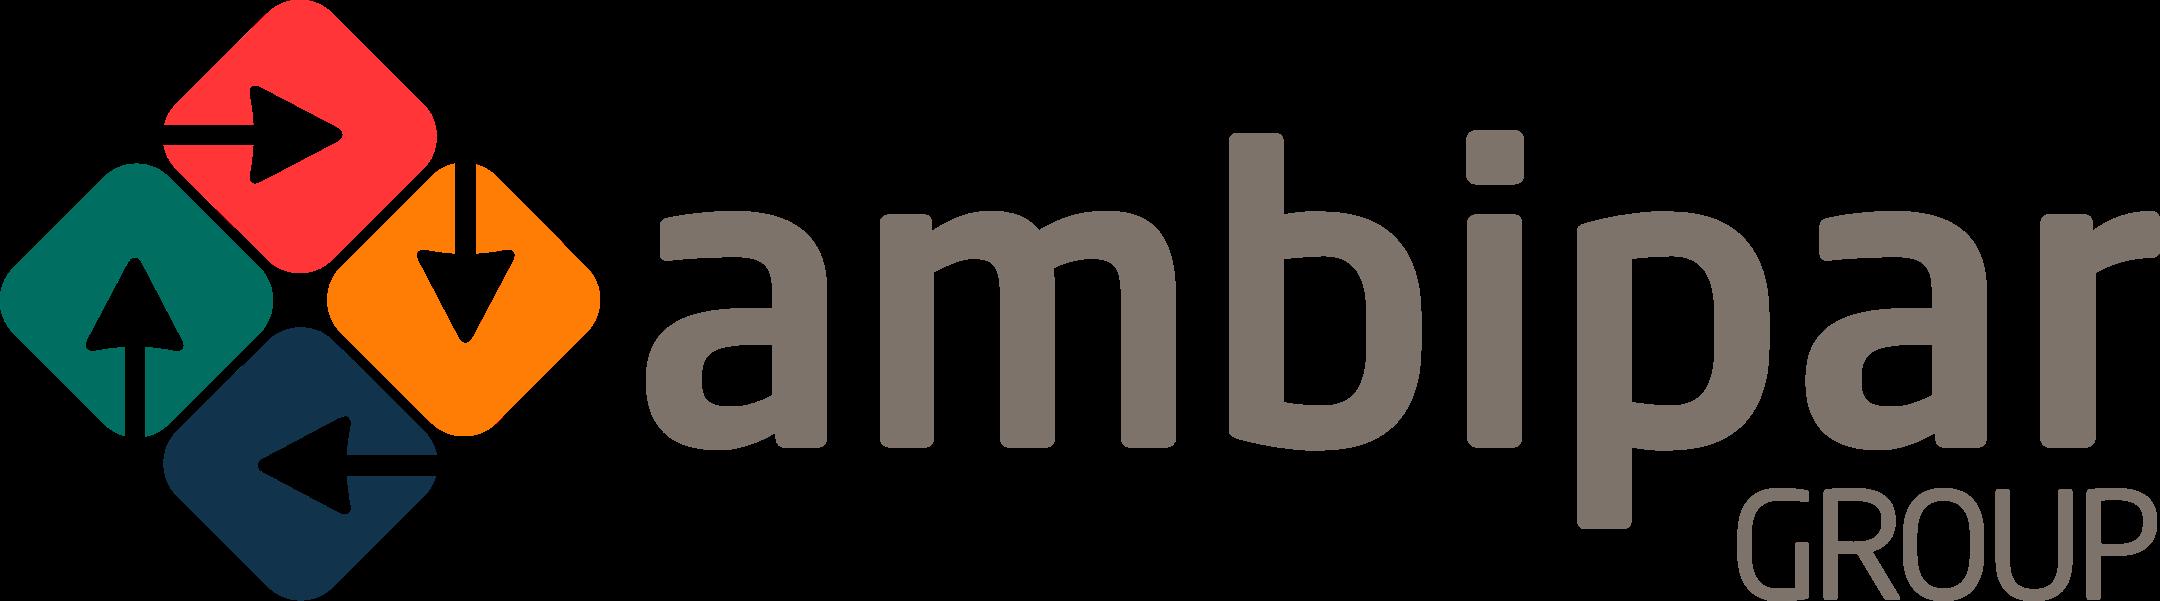 ambipar logo 1 - Ambipar Group Logo